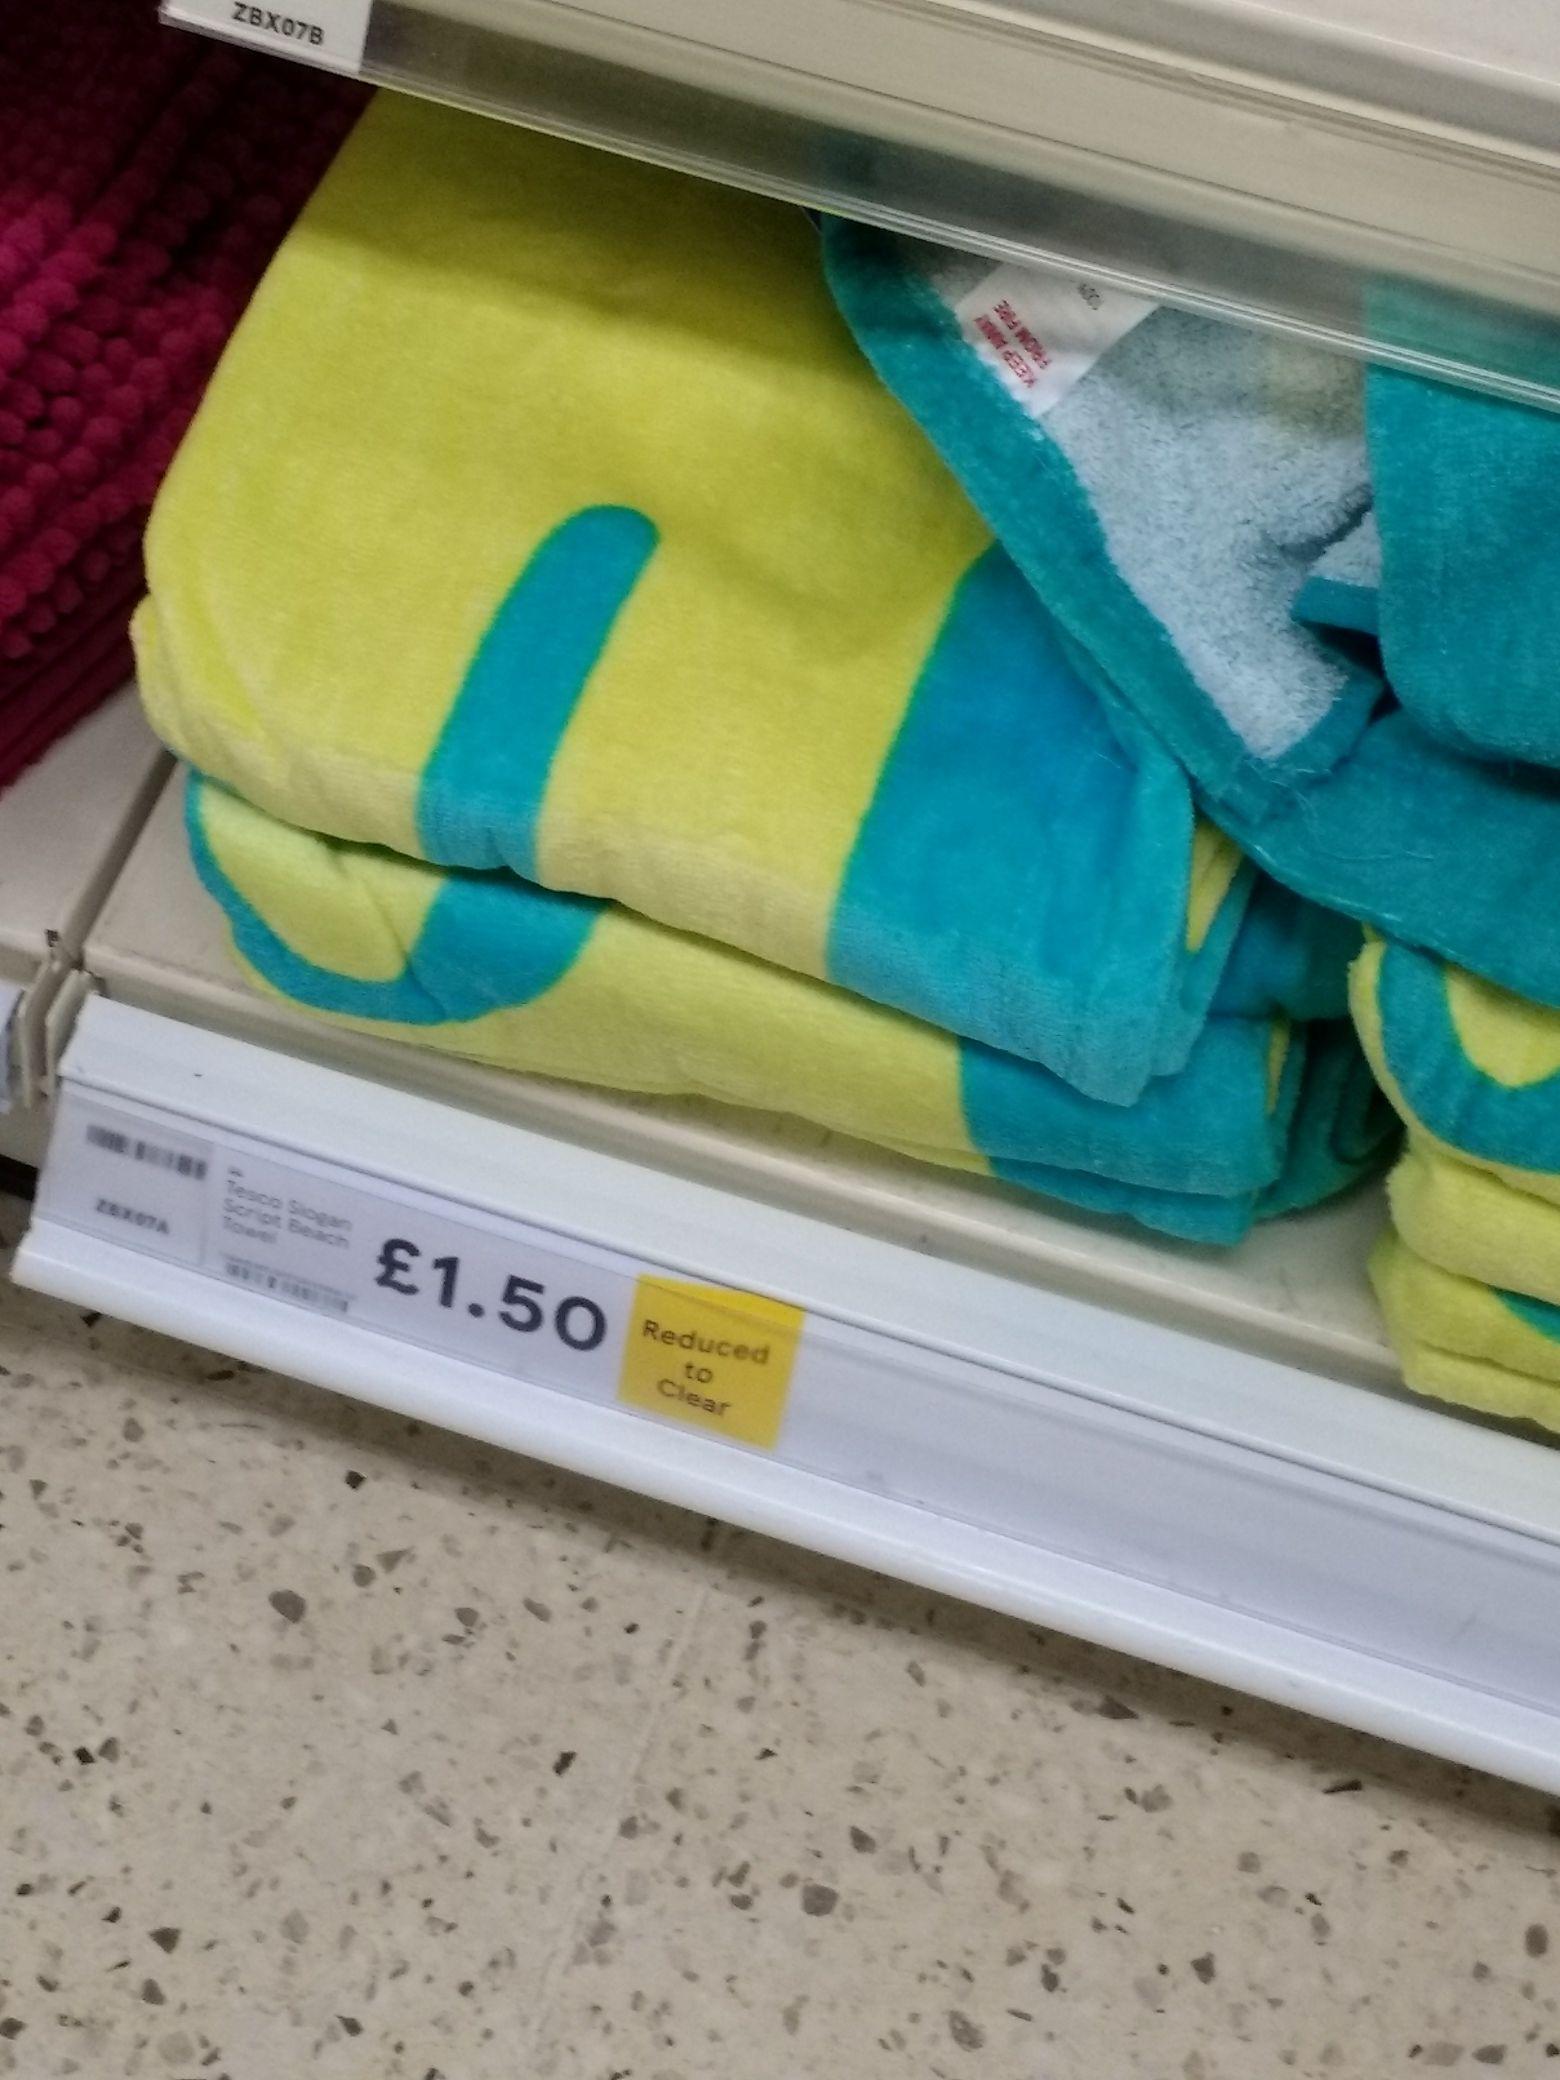 Tesco beach towel £1.50 instore - Burnley